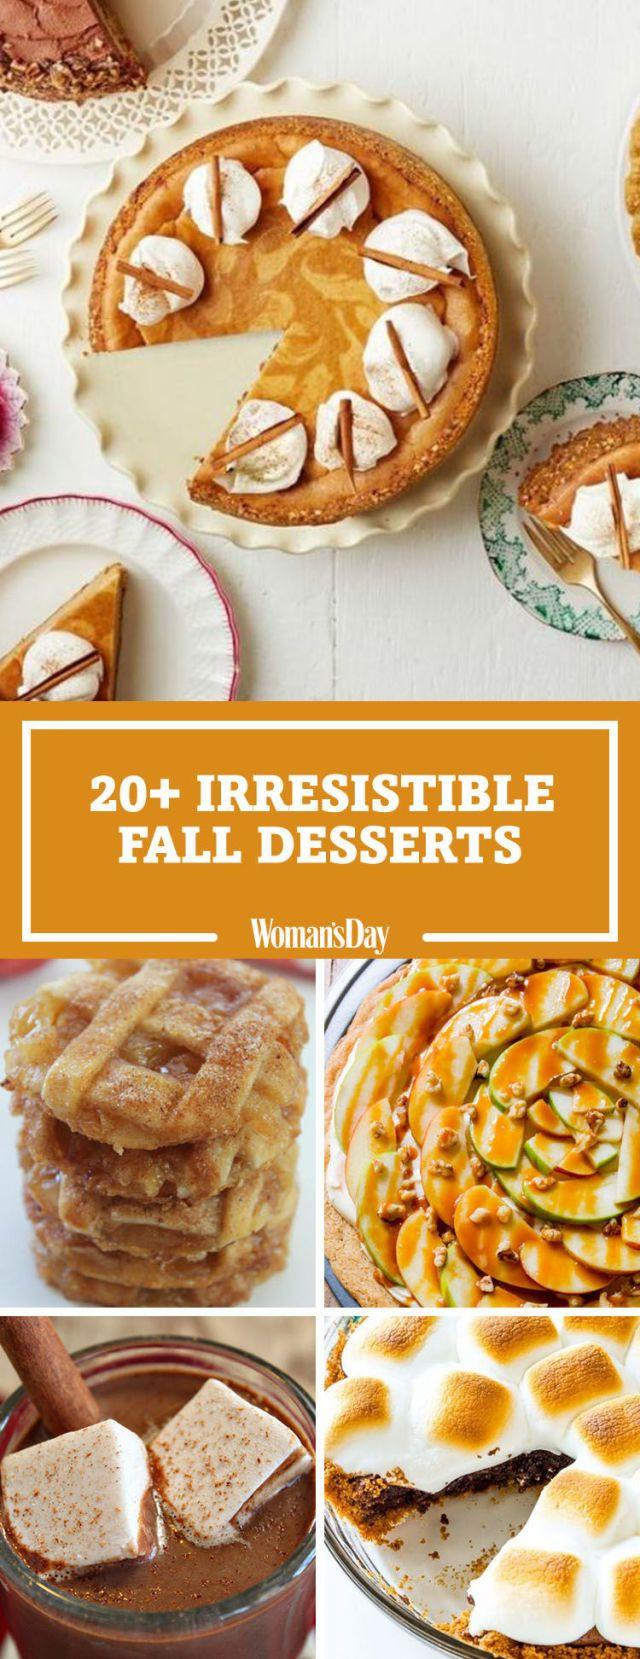 Fall Dessert Ideas  31 Easy Fall Desserts Best Recipes for Autumn Desserts